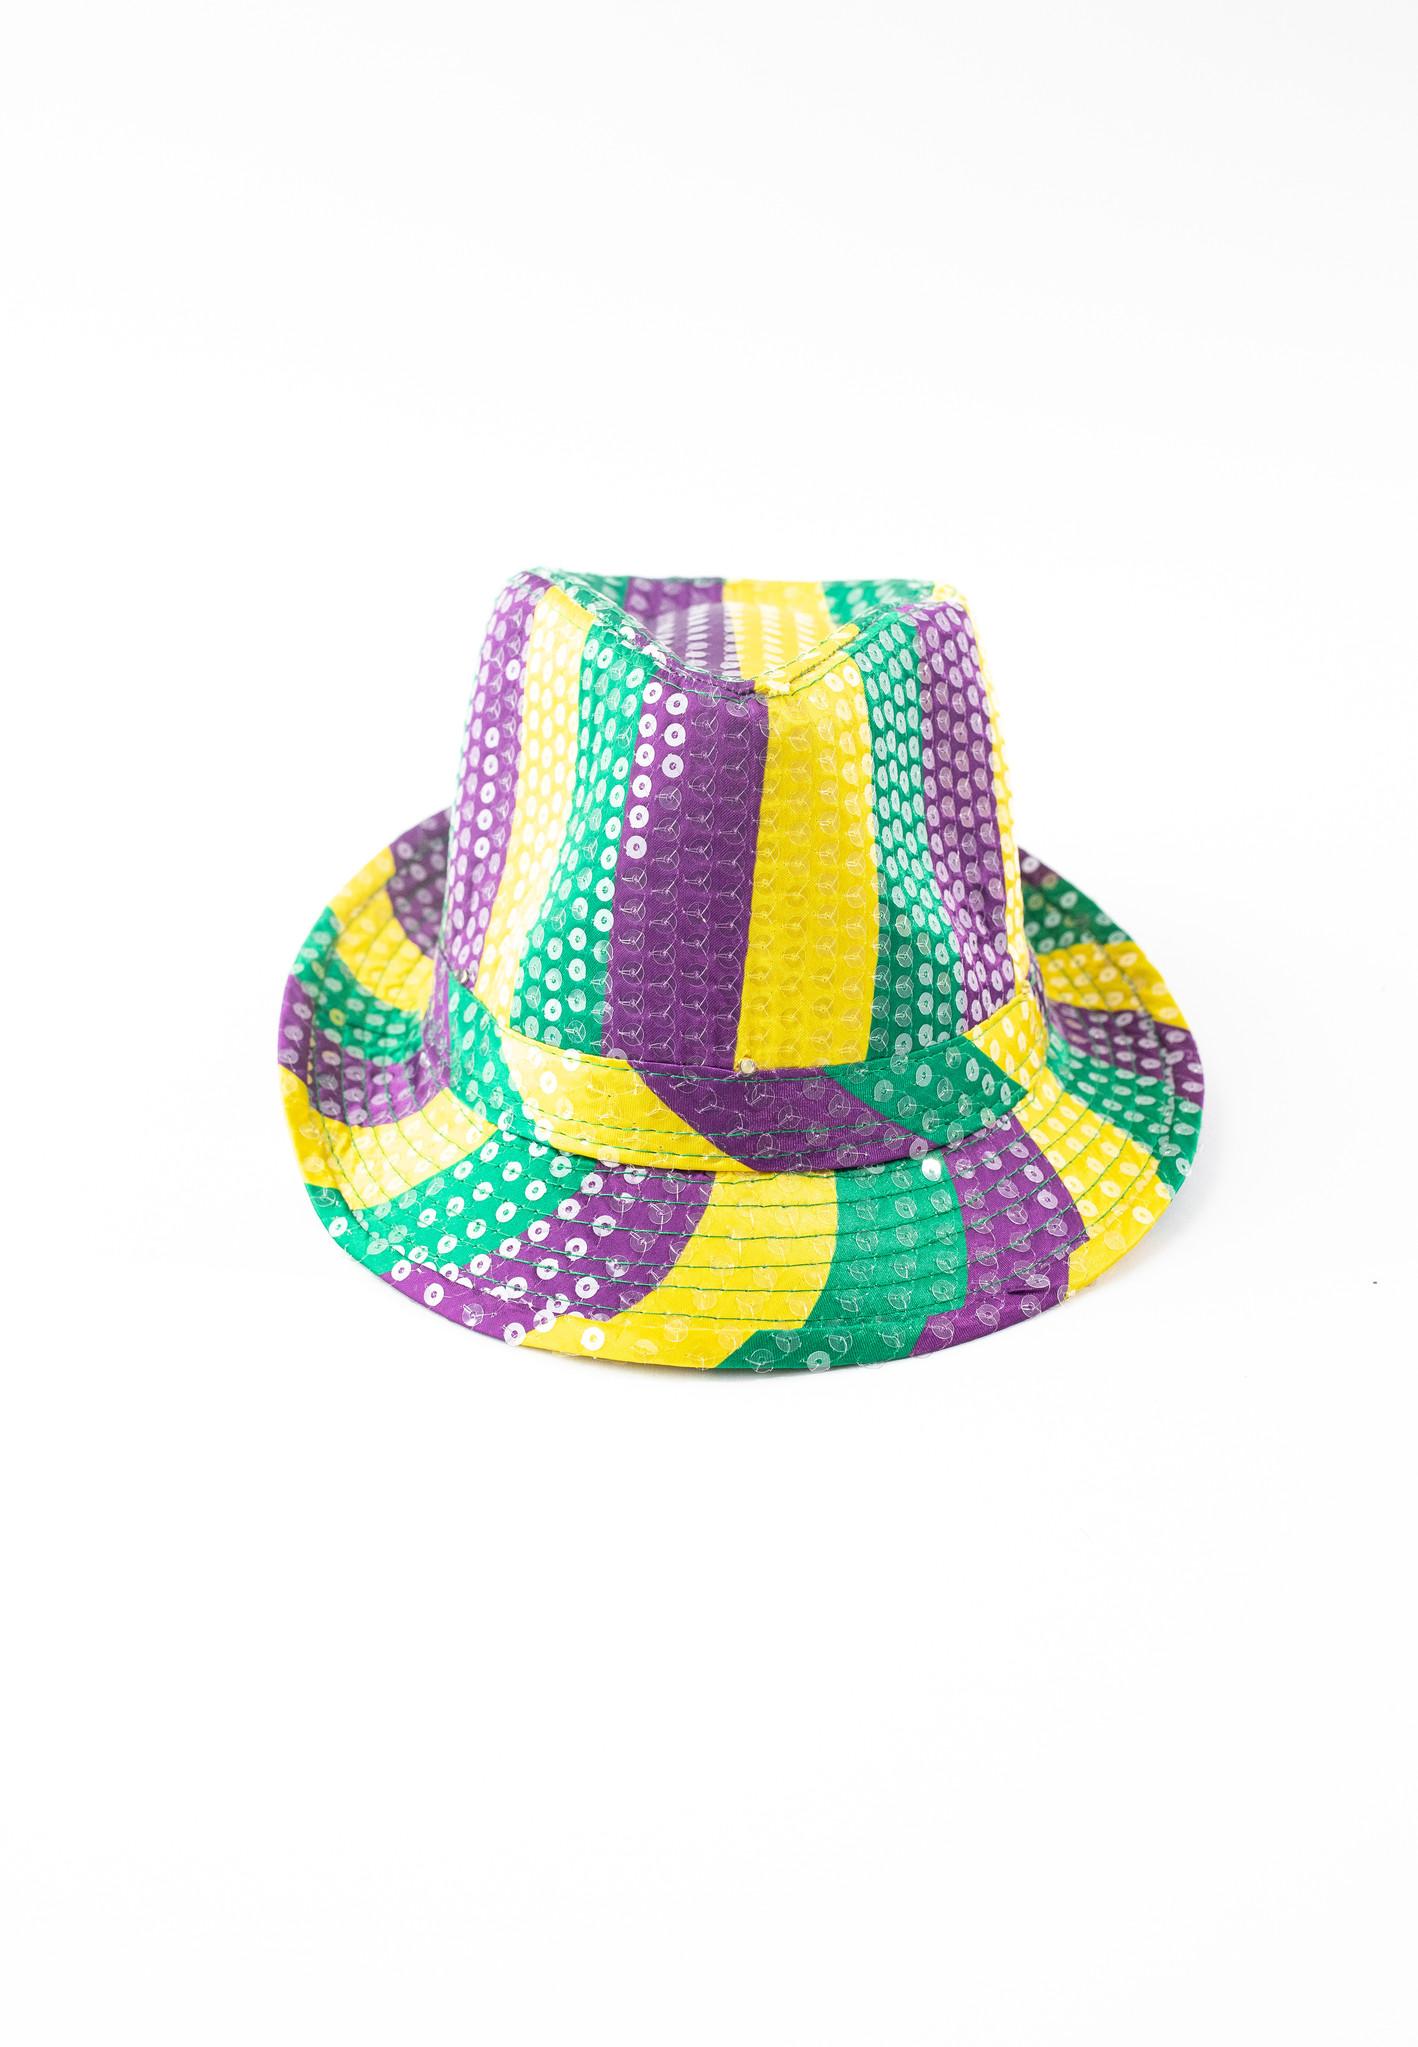 Light Up Mardi Gras Fedora, Purple, Green, & Gold